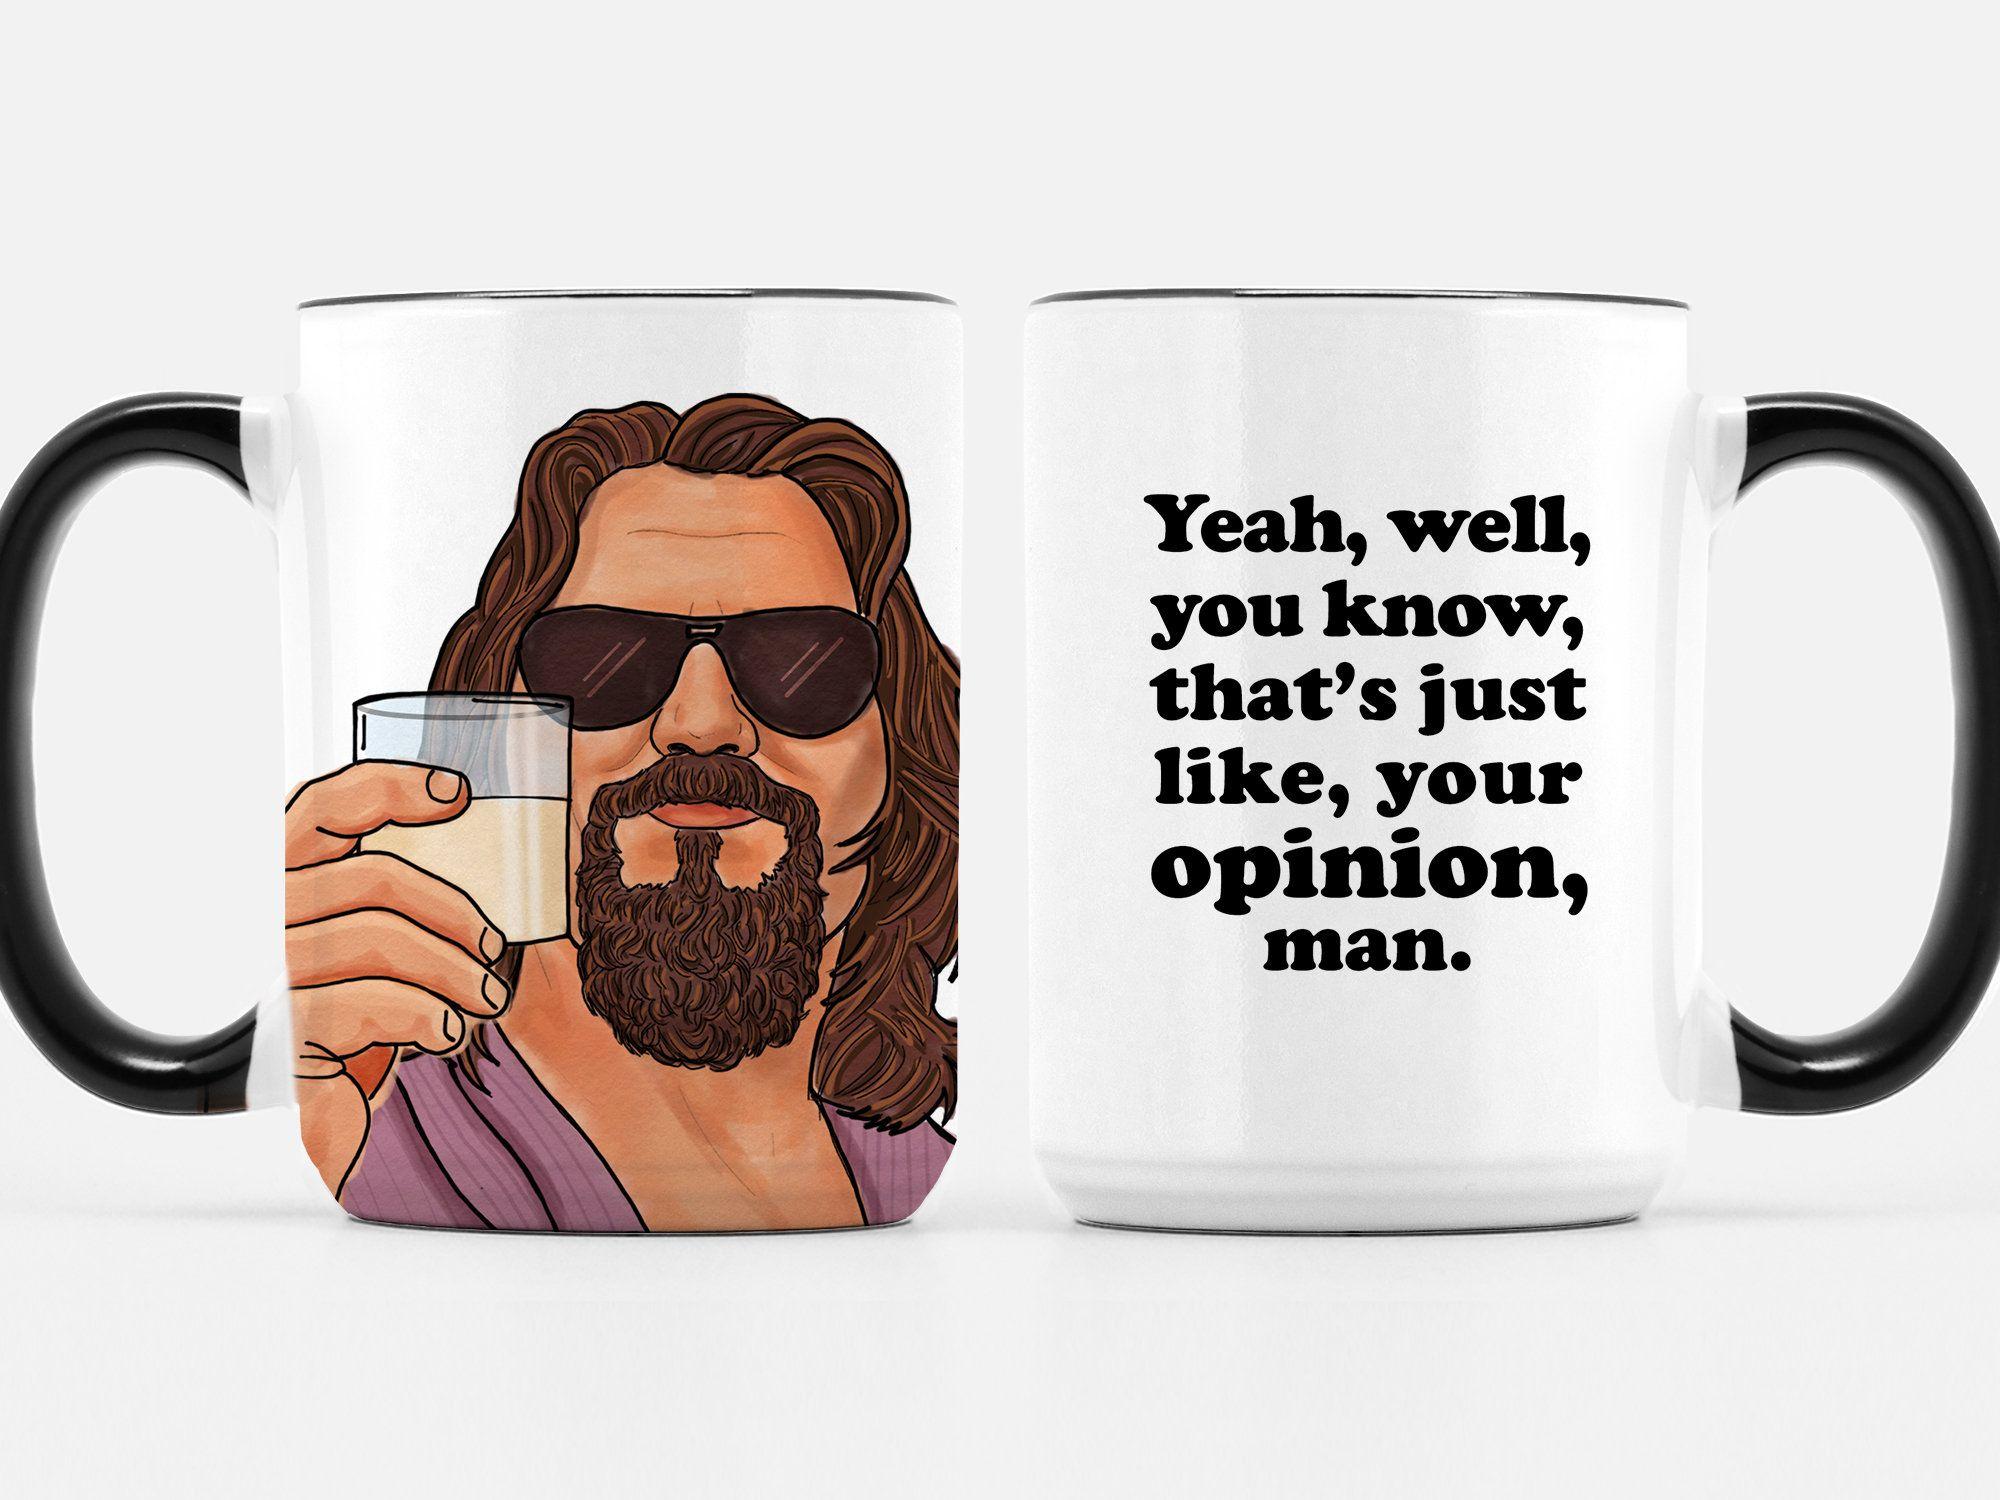 25 Mugs Ideas In 2021 Mugs Misery Loves Company Michael Scott Boom Roasted